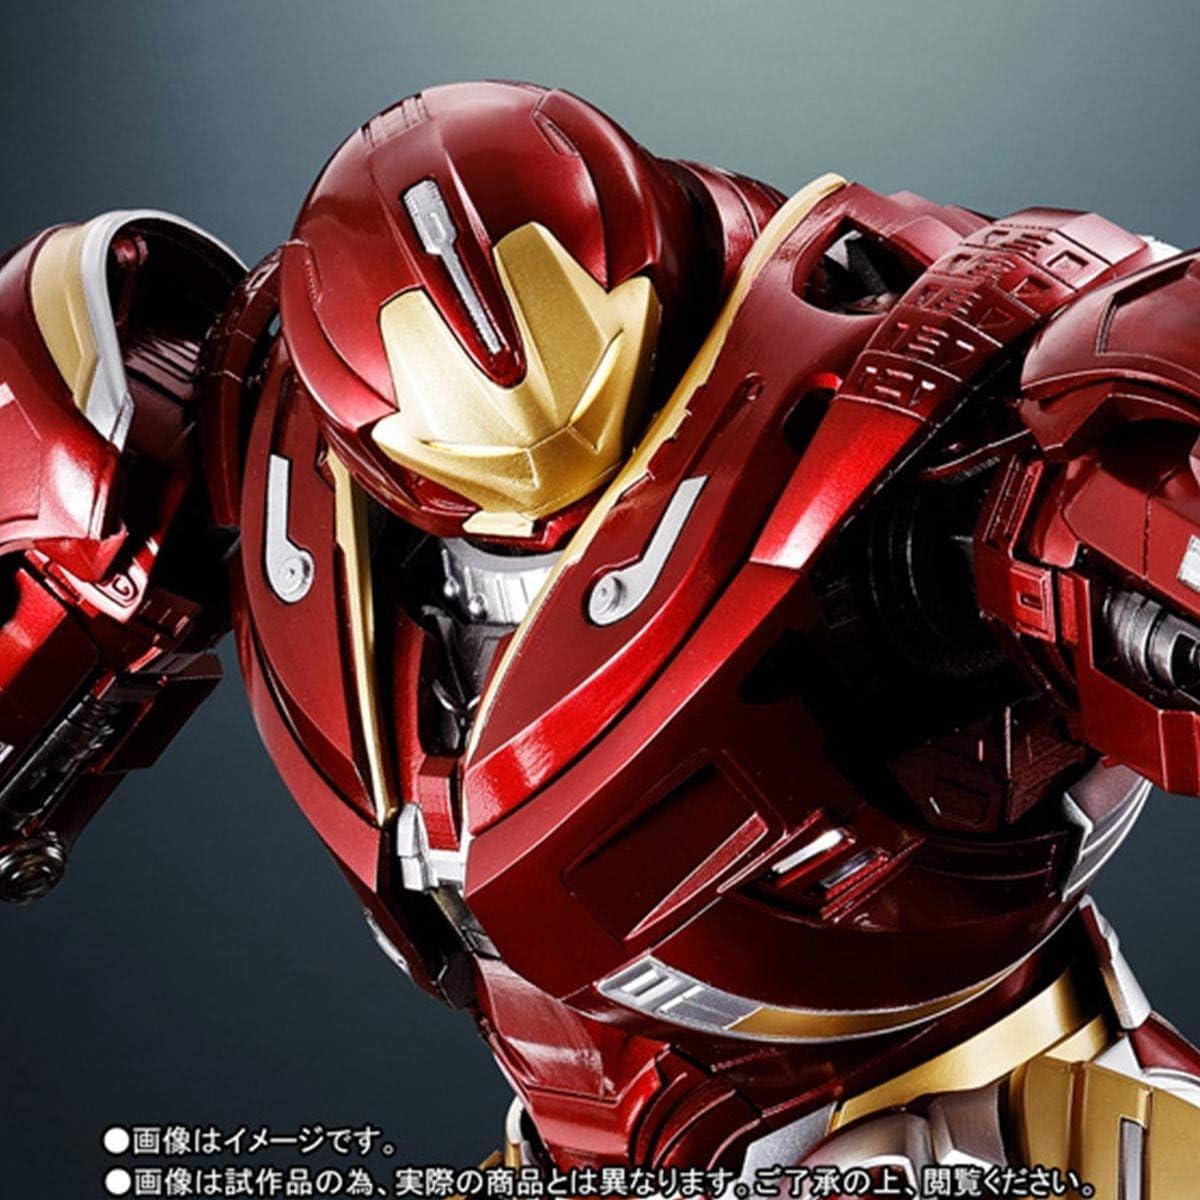 Figuarts Hulkbuster MK Infinity War BAS55023 II Avengers Bandai Tamashii Nations Chogokin x S.H